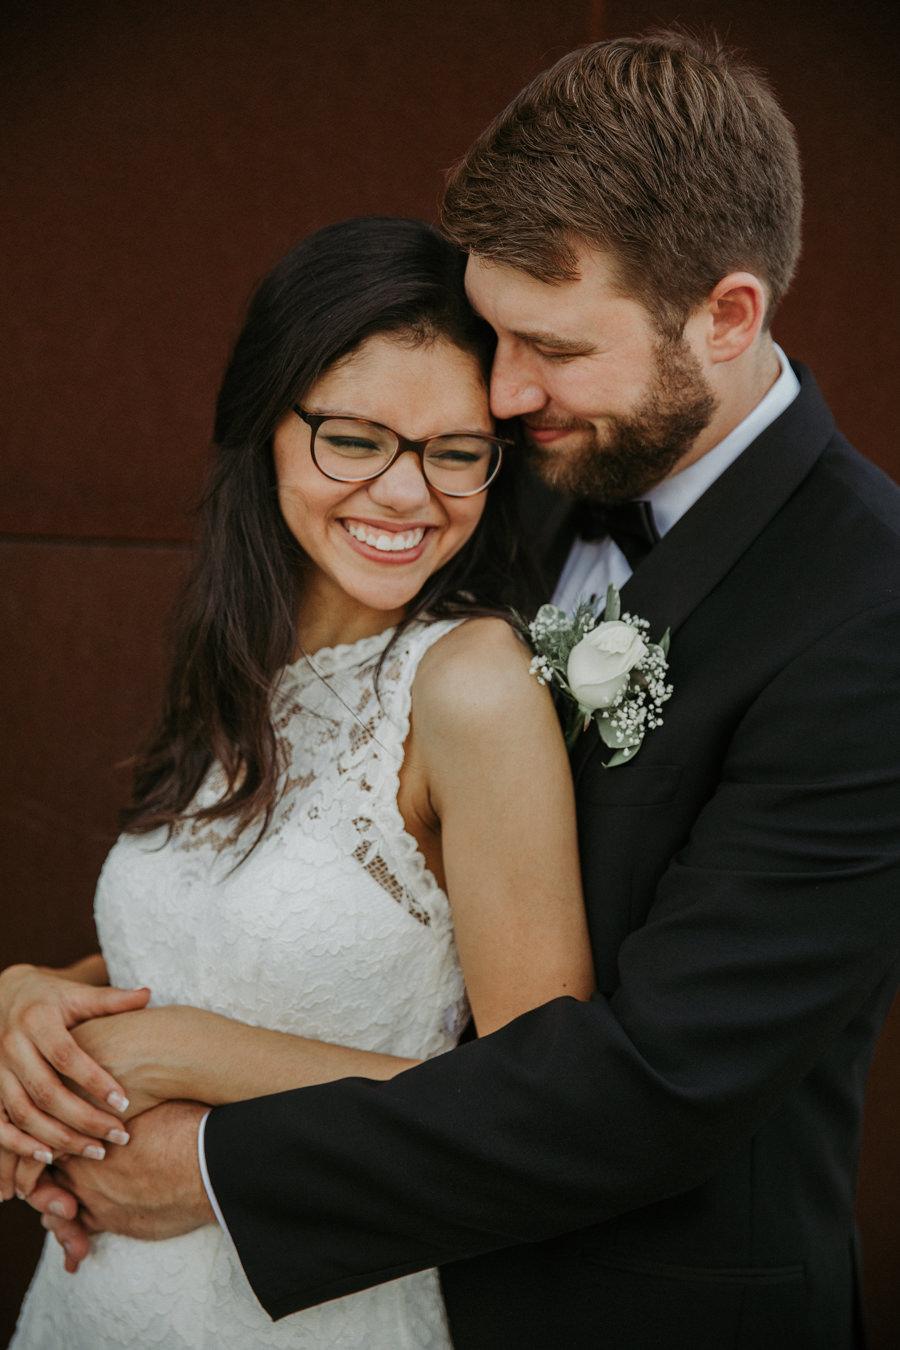 Tampa Heights Industrial Wedding at Cavu Emmy RJ-109.jpg